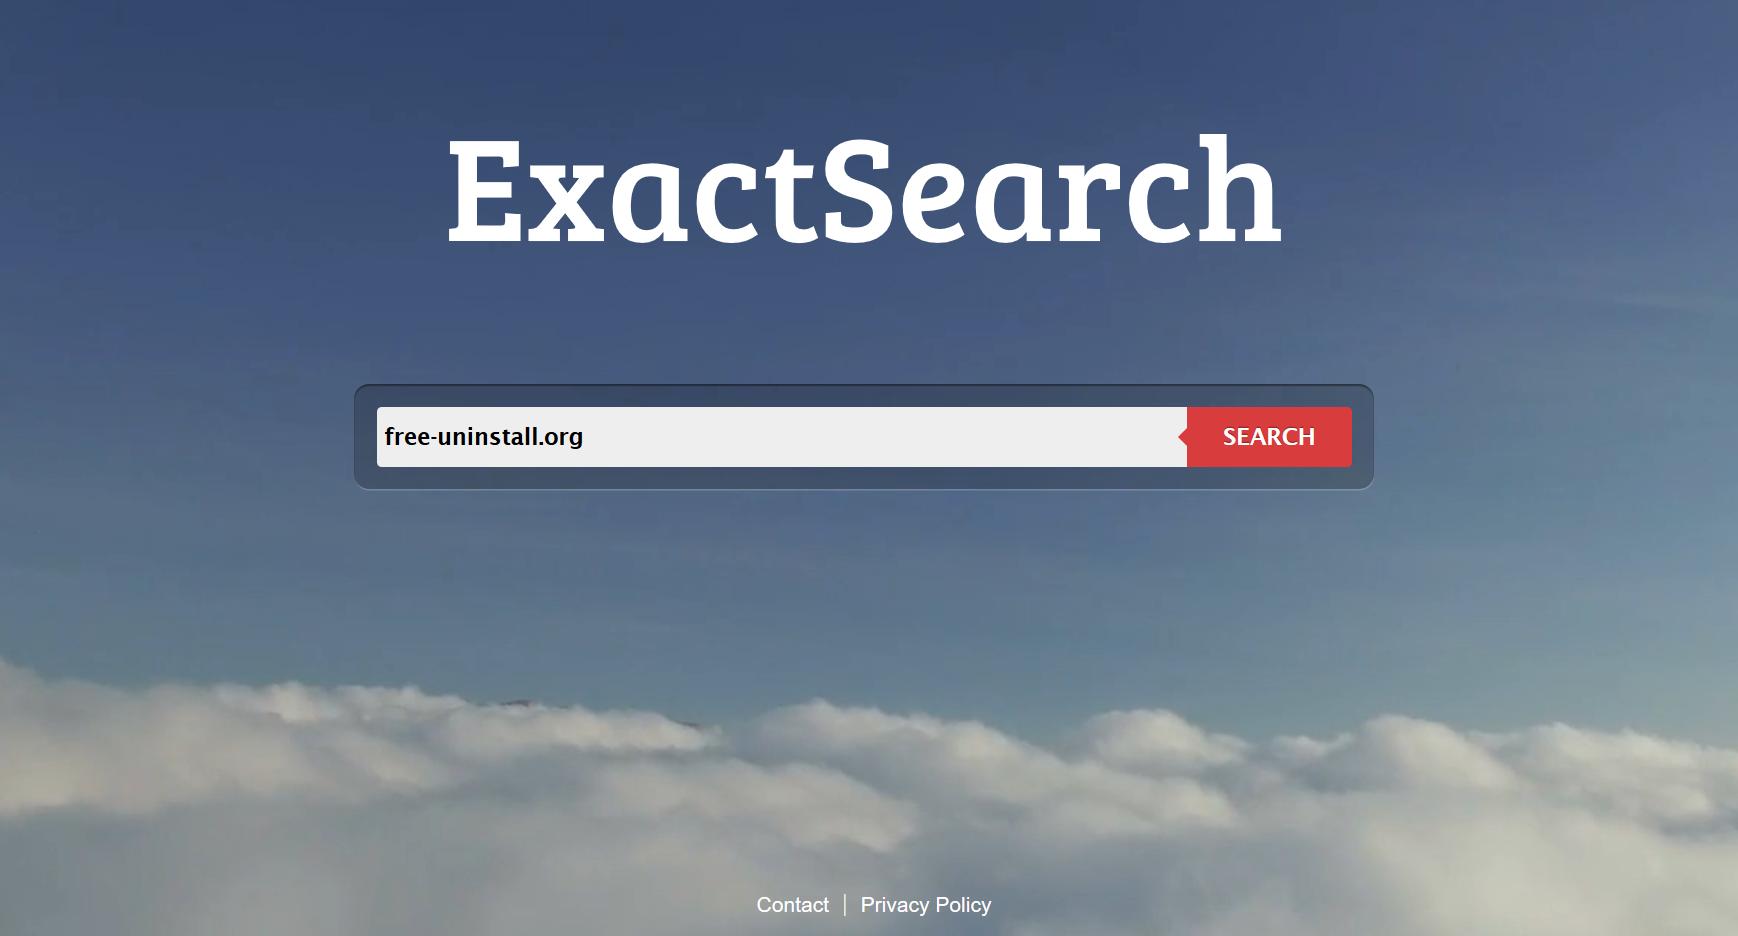 Exactsearch.org hijacker